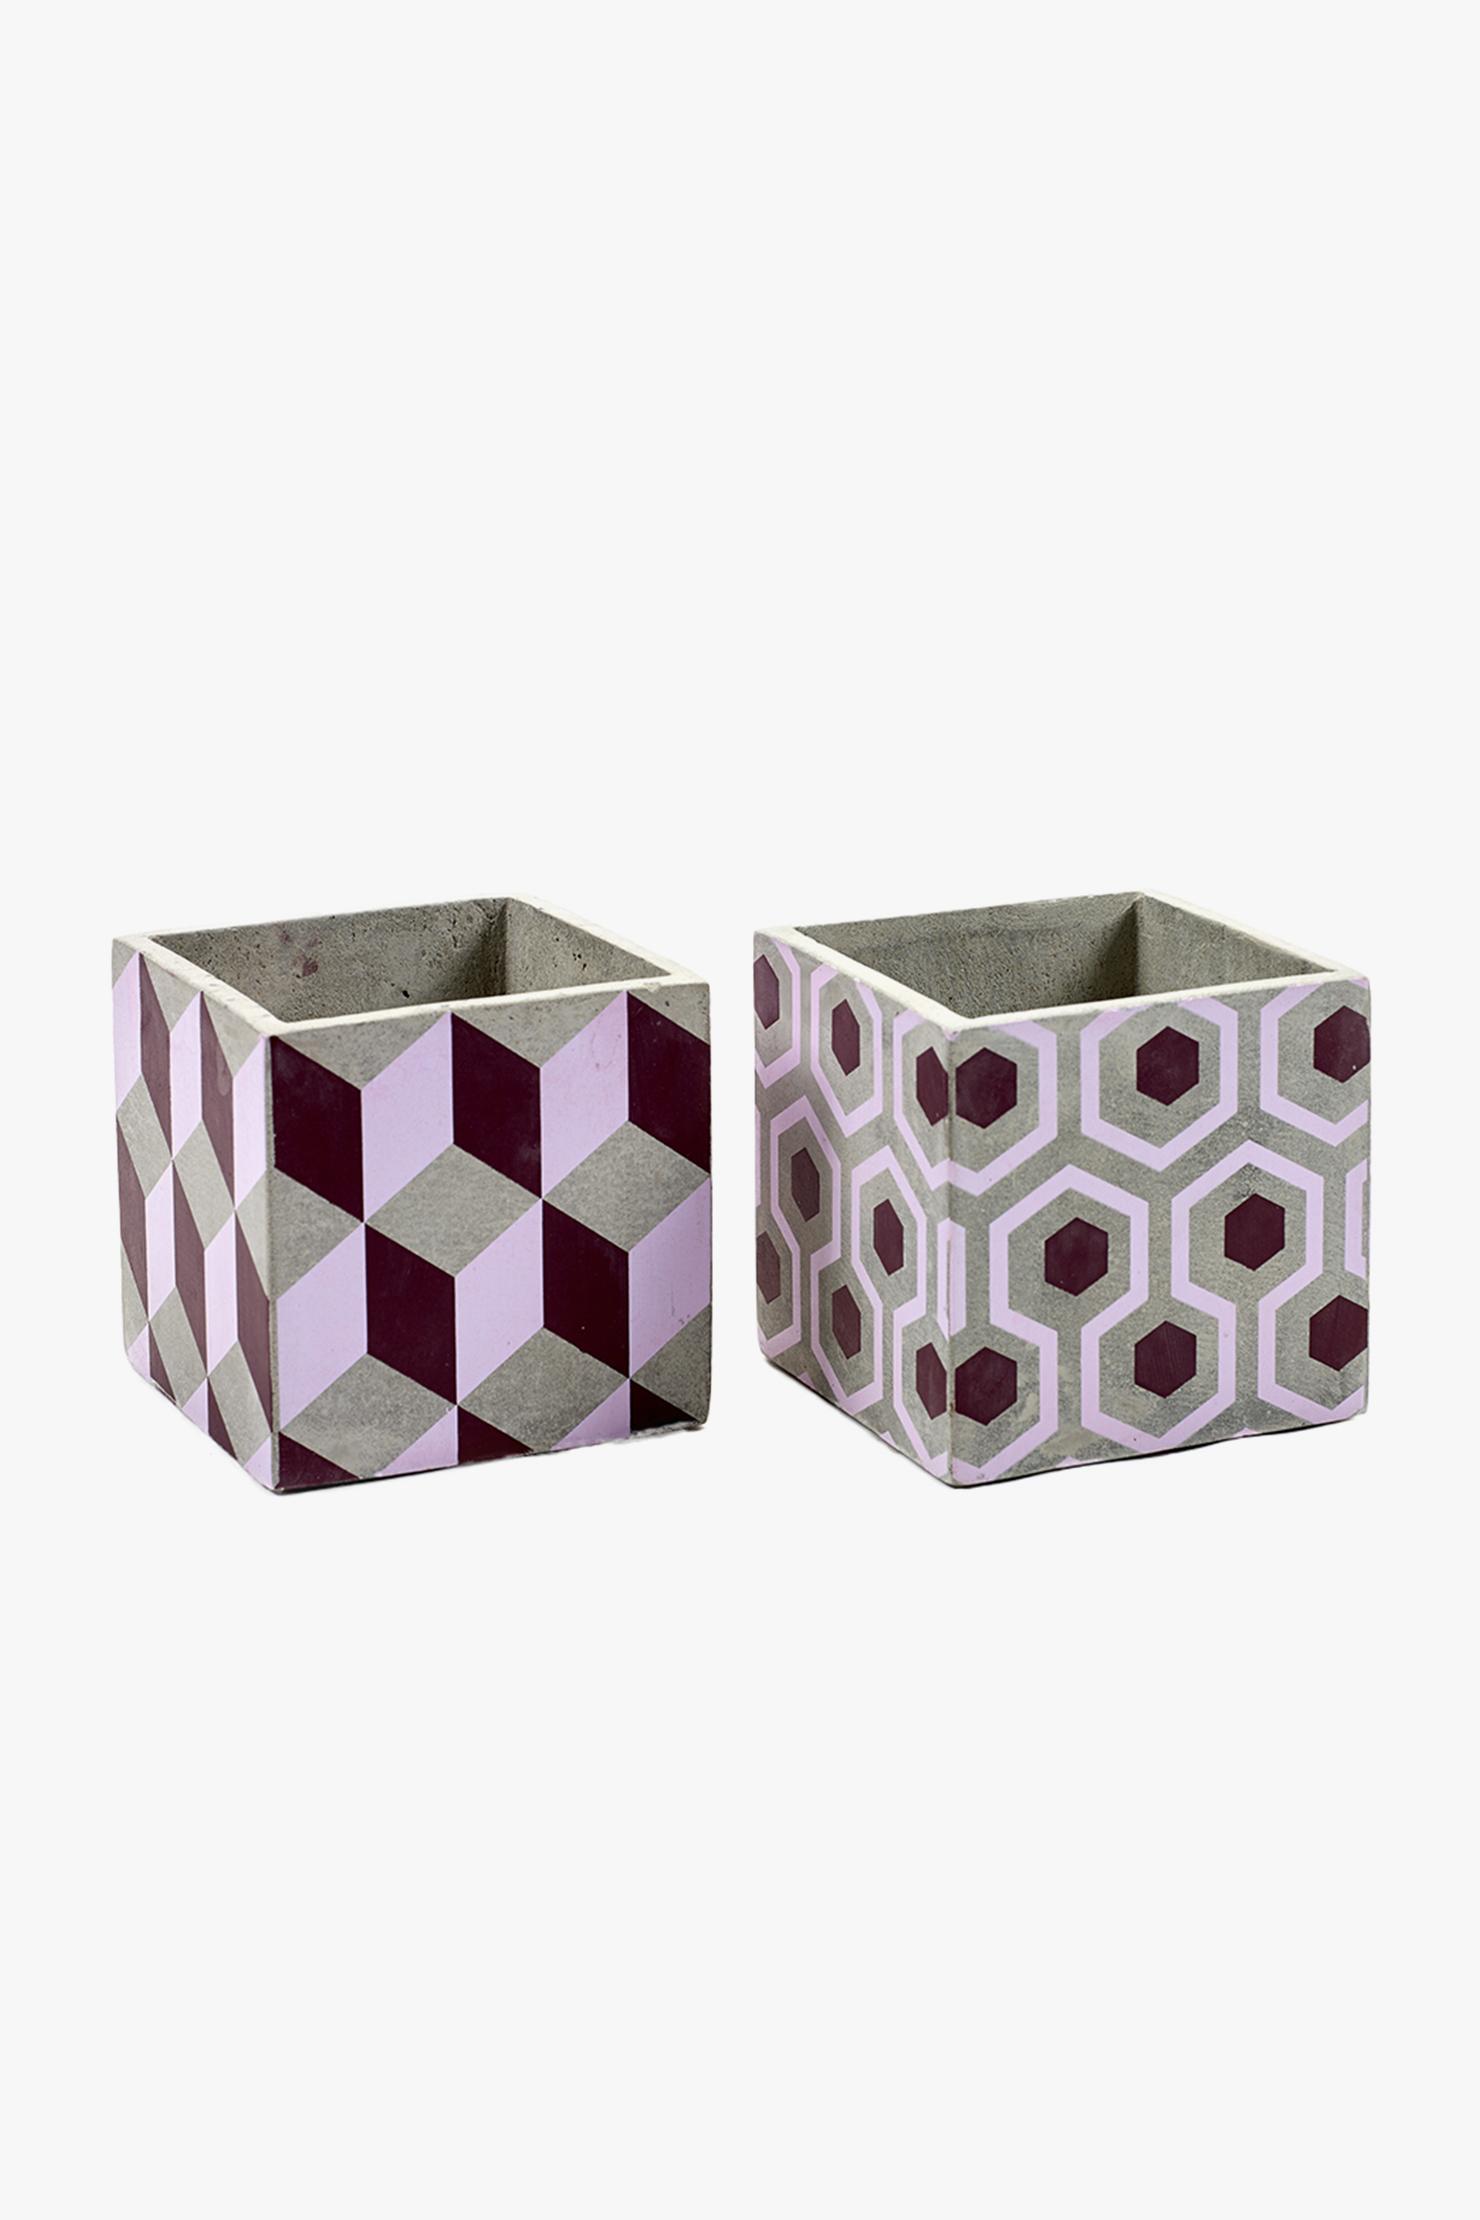 cache-pots-design-beton-serax-09